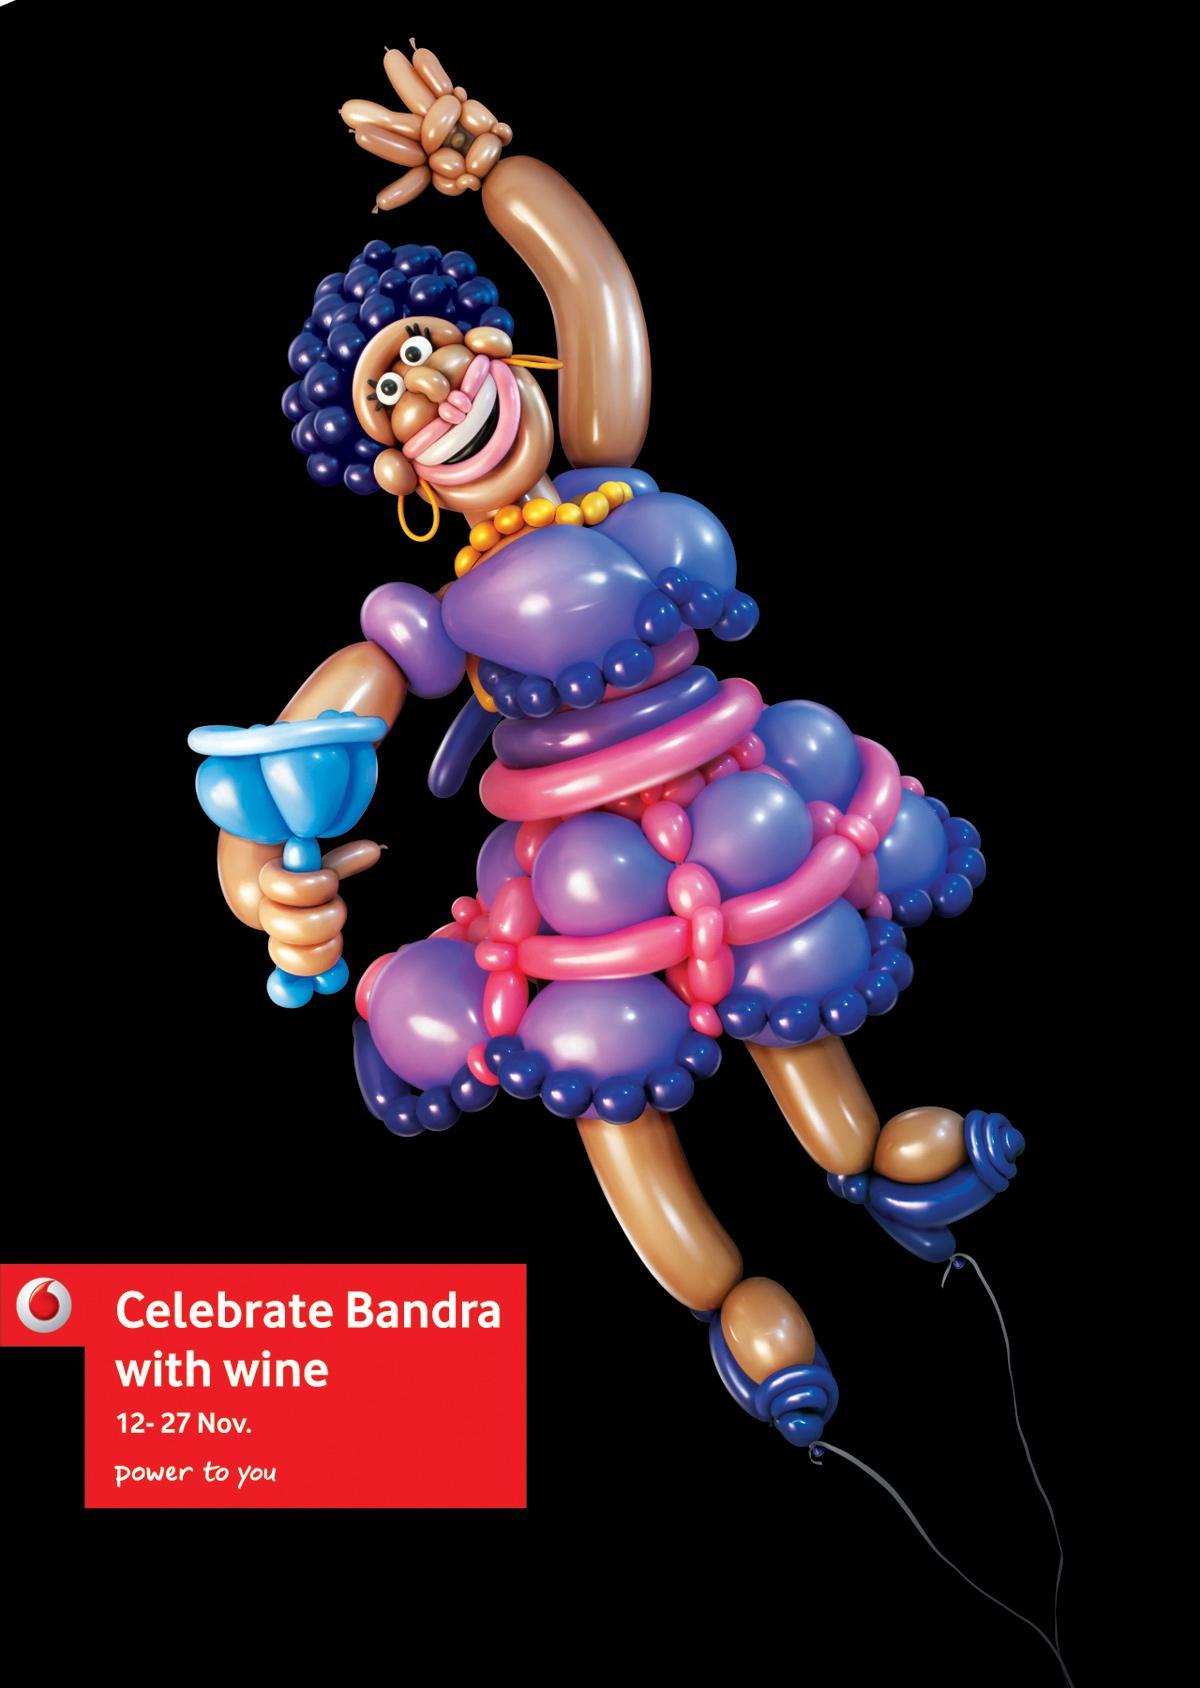 Vodafone Print Ad -  Celebrate Bandra, Drunk Lady